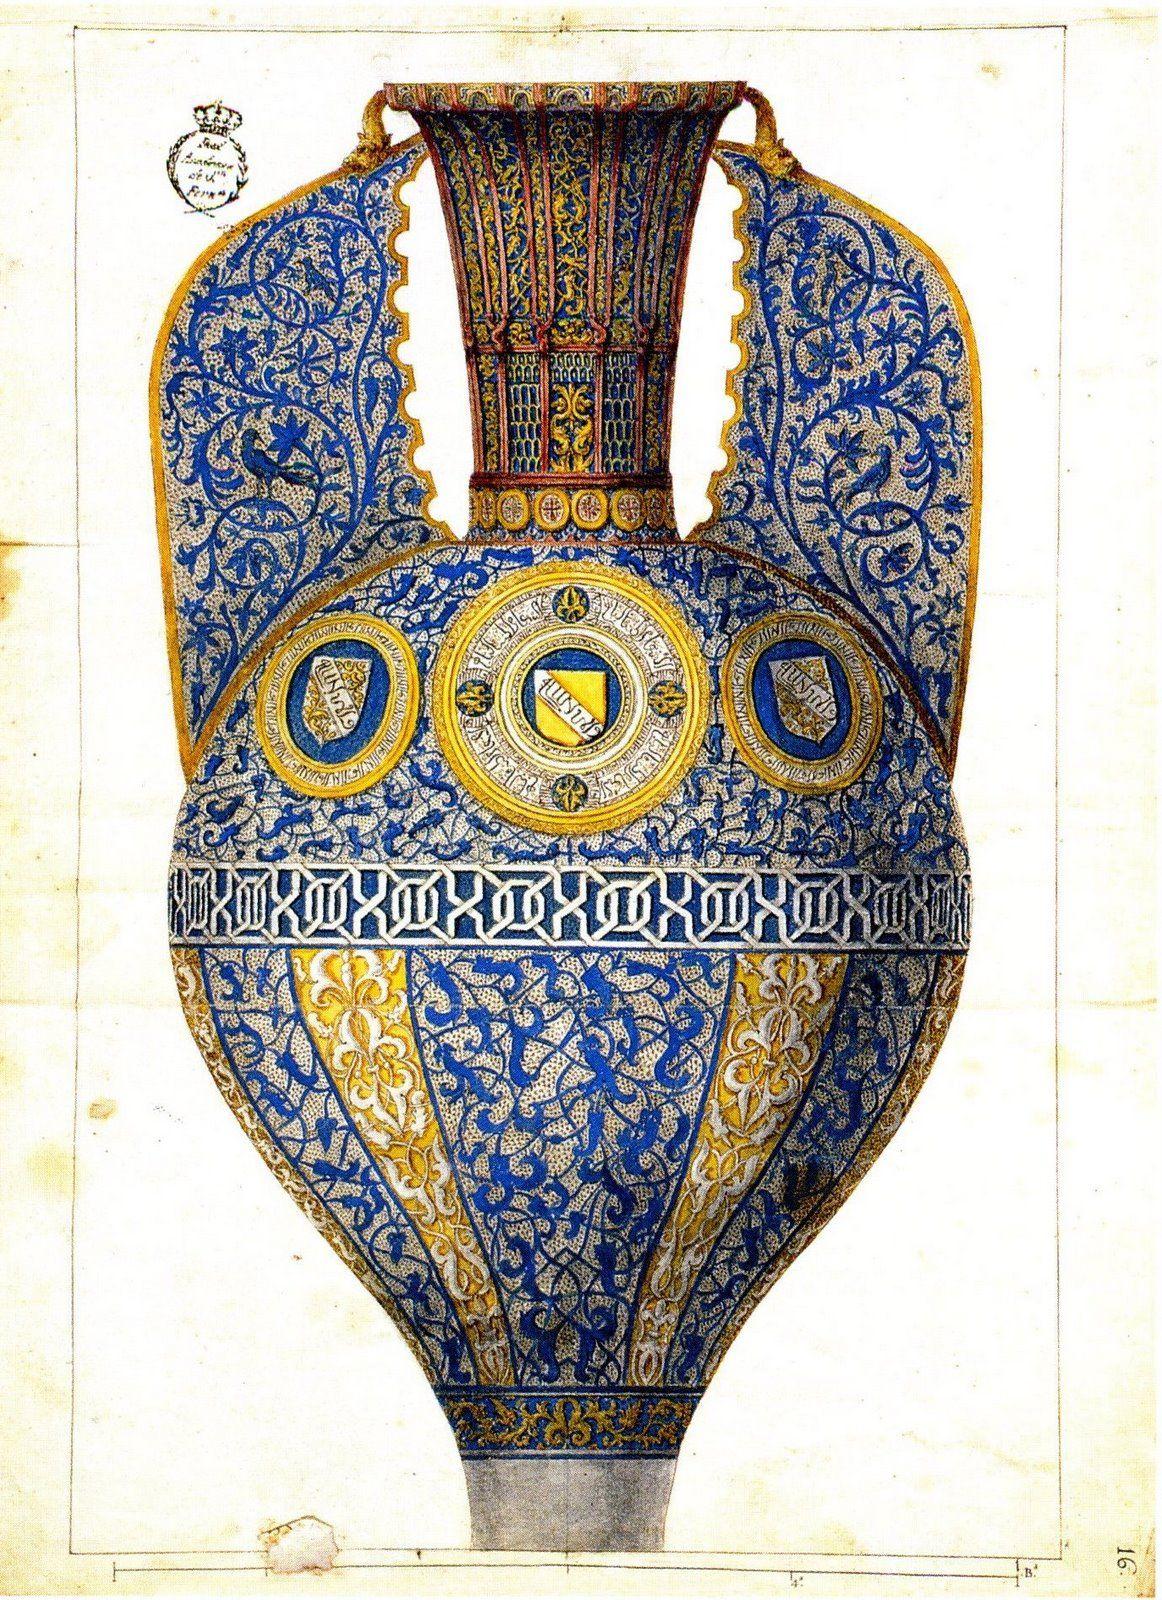 El famoso jarron de las gacelas encontrado en la alhambra for Alhambra decoration